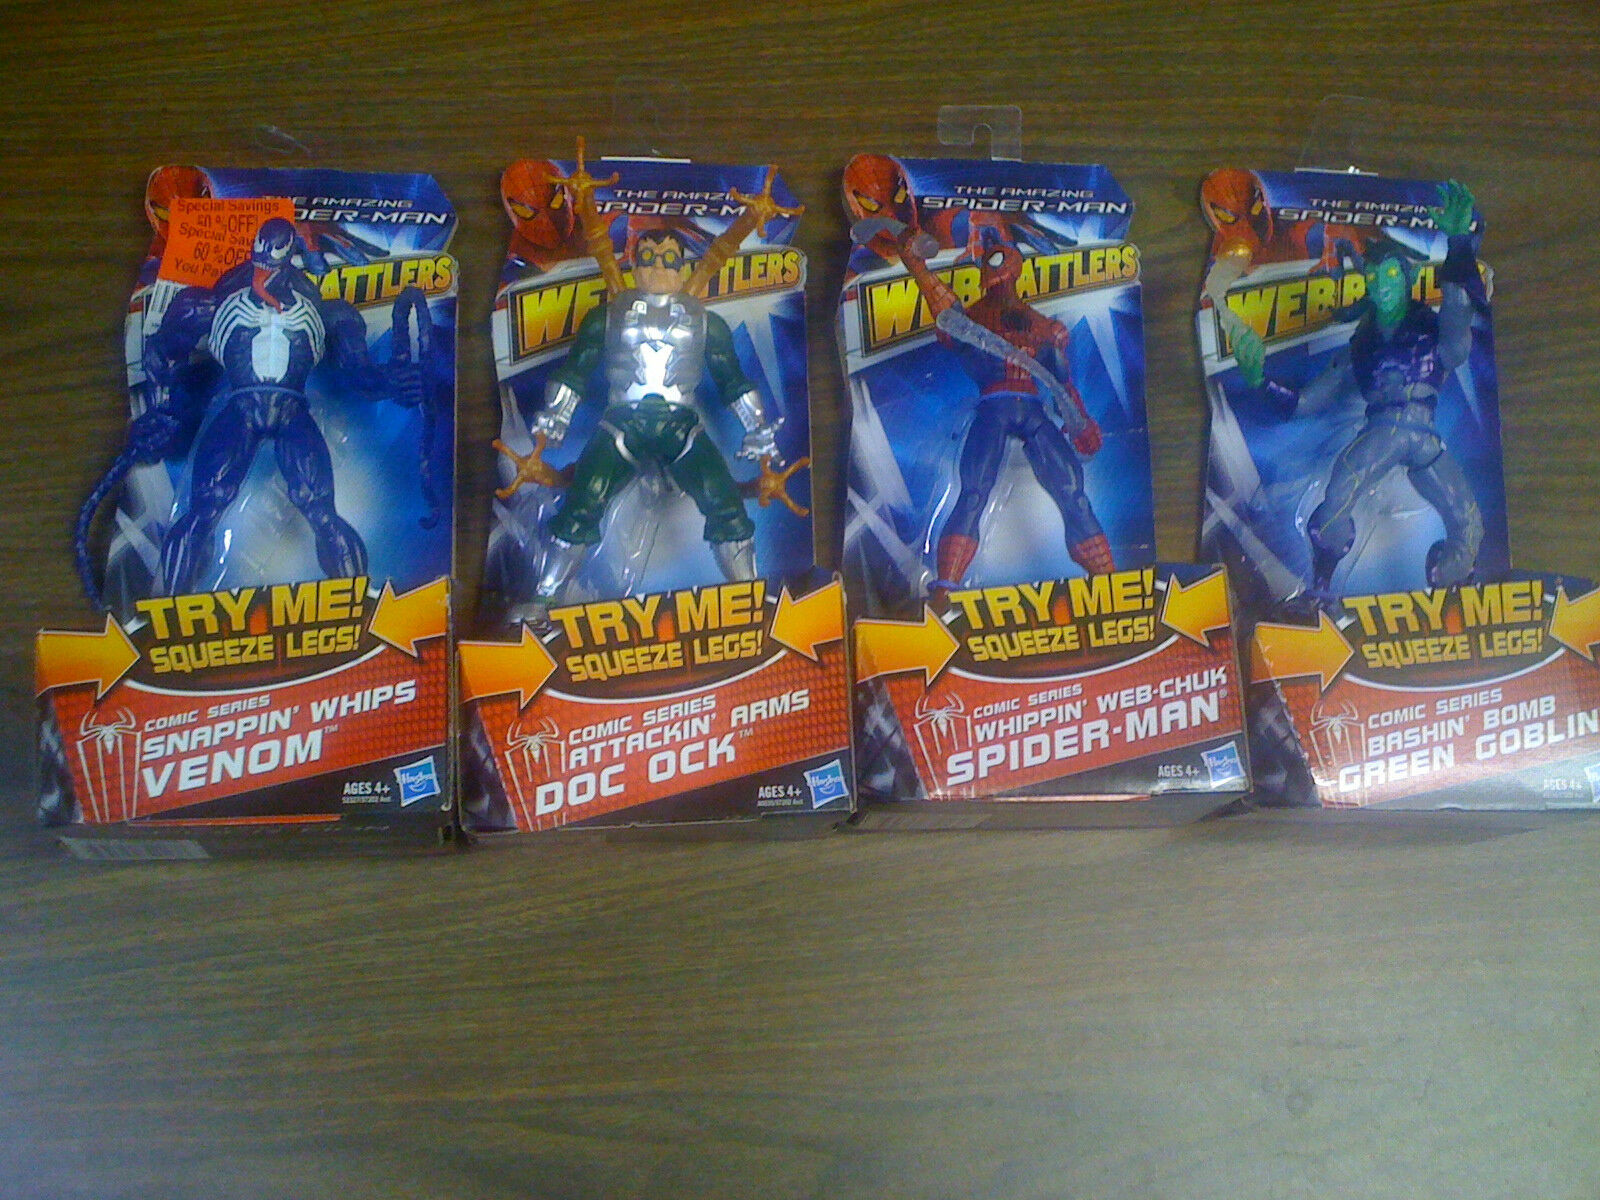 Marvel The Amazing Spiderman Web Battlers Set Of 4 Figures Figures Figures NEW FREE SHIP US 7aefc2